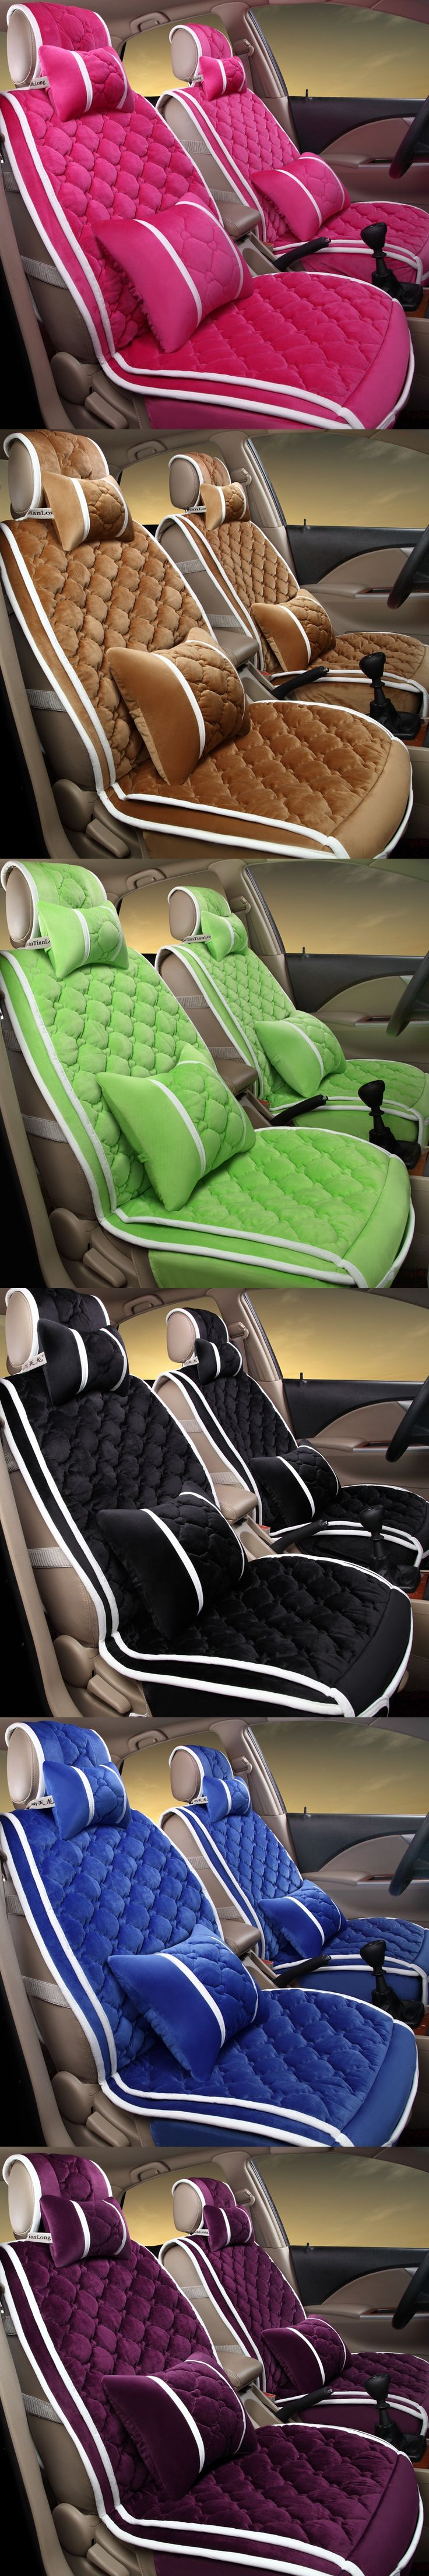 New 3D Sport Car Seat Cover General Cushion,Velvet,Car Styling For BMW Audi HONDA CRV Ford Nissan Sedan Ford